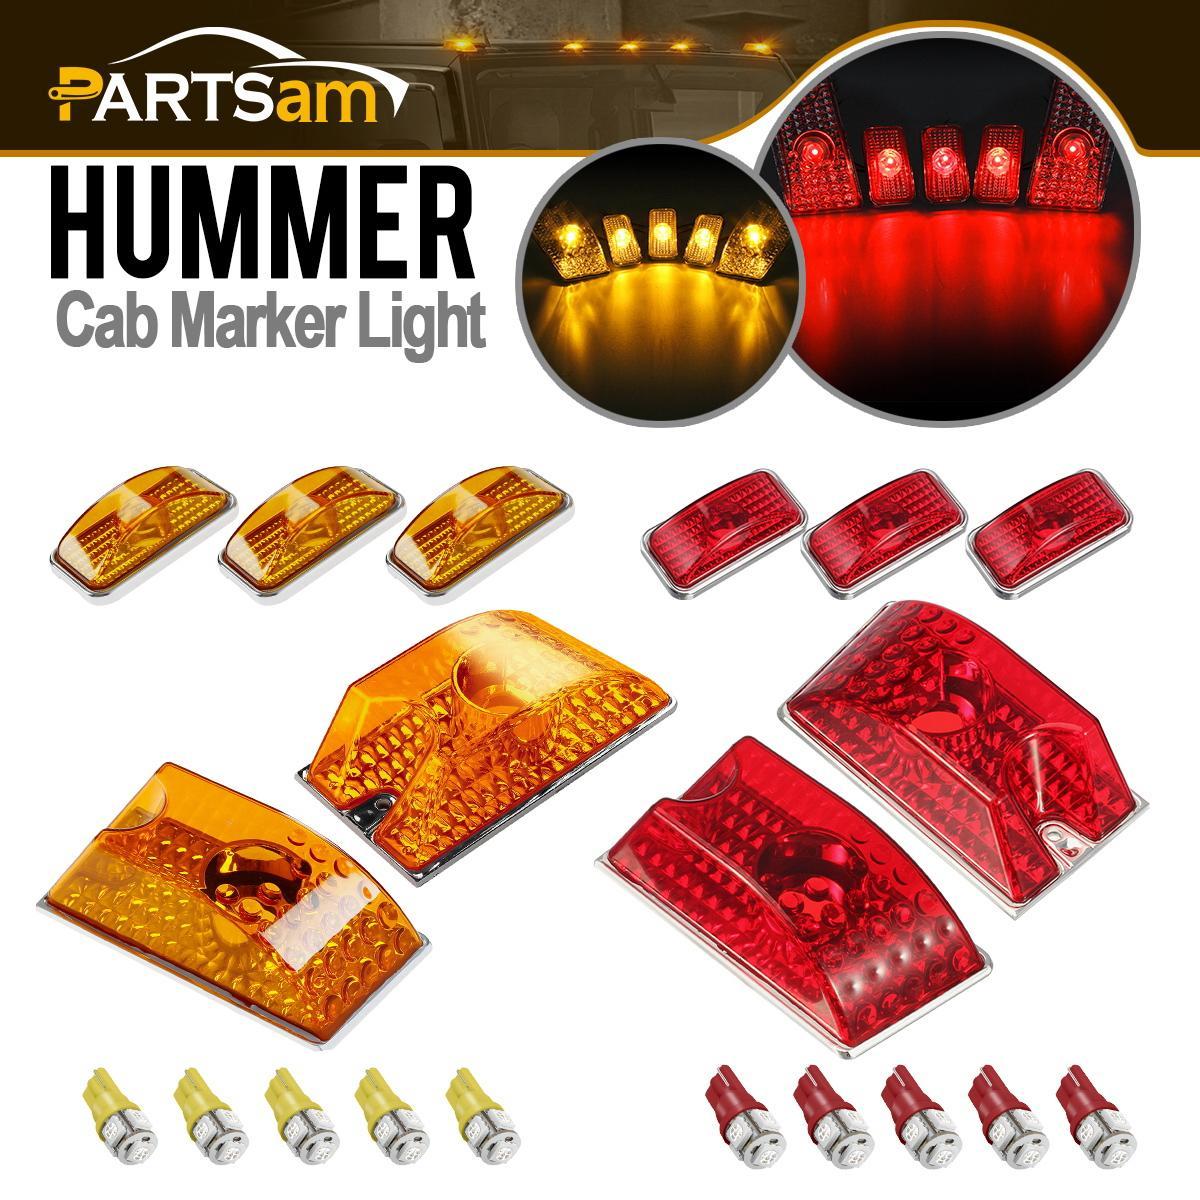 10xAmber//Red Lens Cab Marker Roof Running Top Lights w//Bulbs for 03-09 Hummer H2